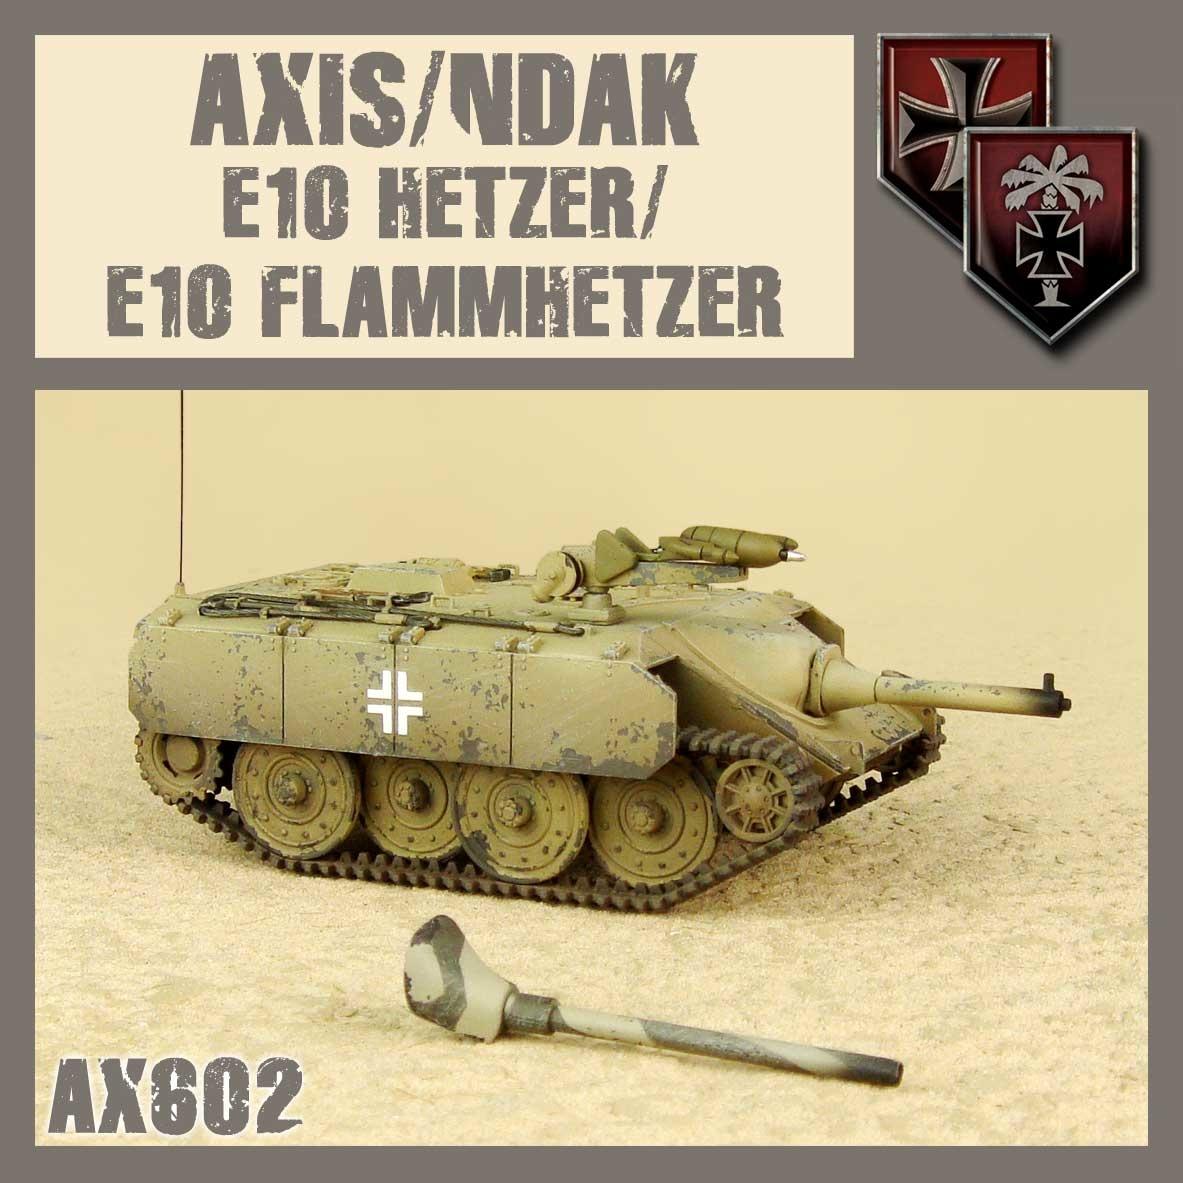 DUST USA DUST DROP-SHIP: Axis/NDAK E10 Hetzer/Flammhetzer